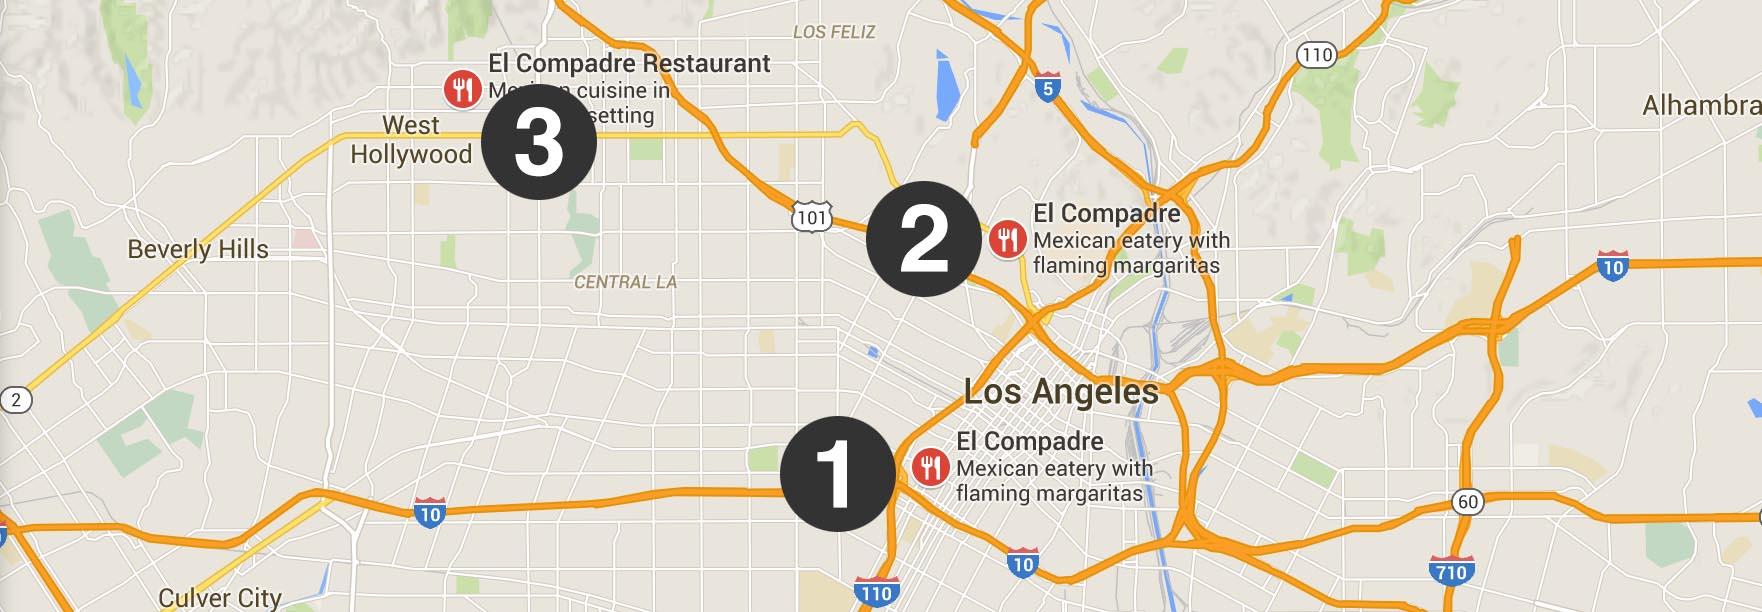 All three locations